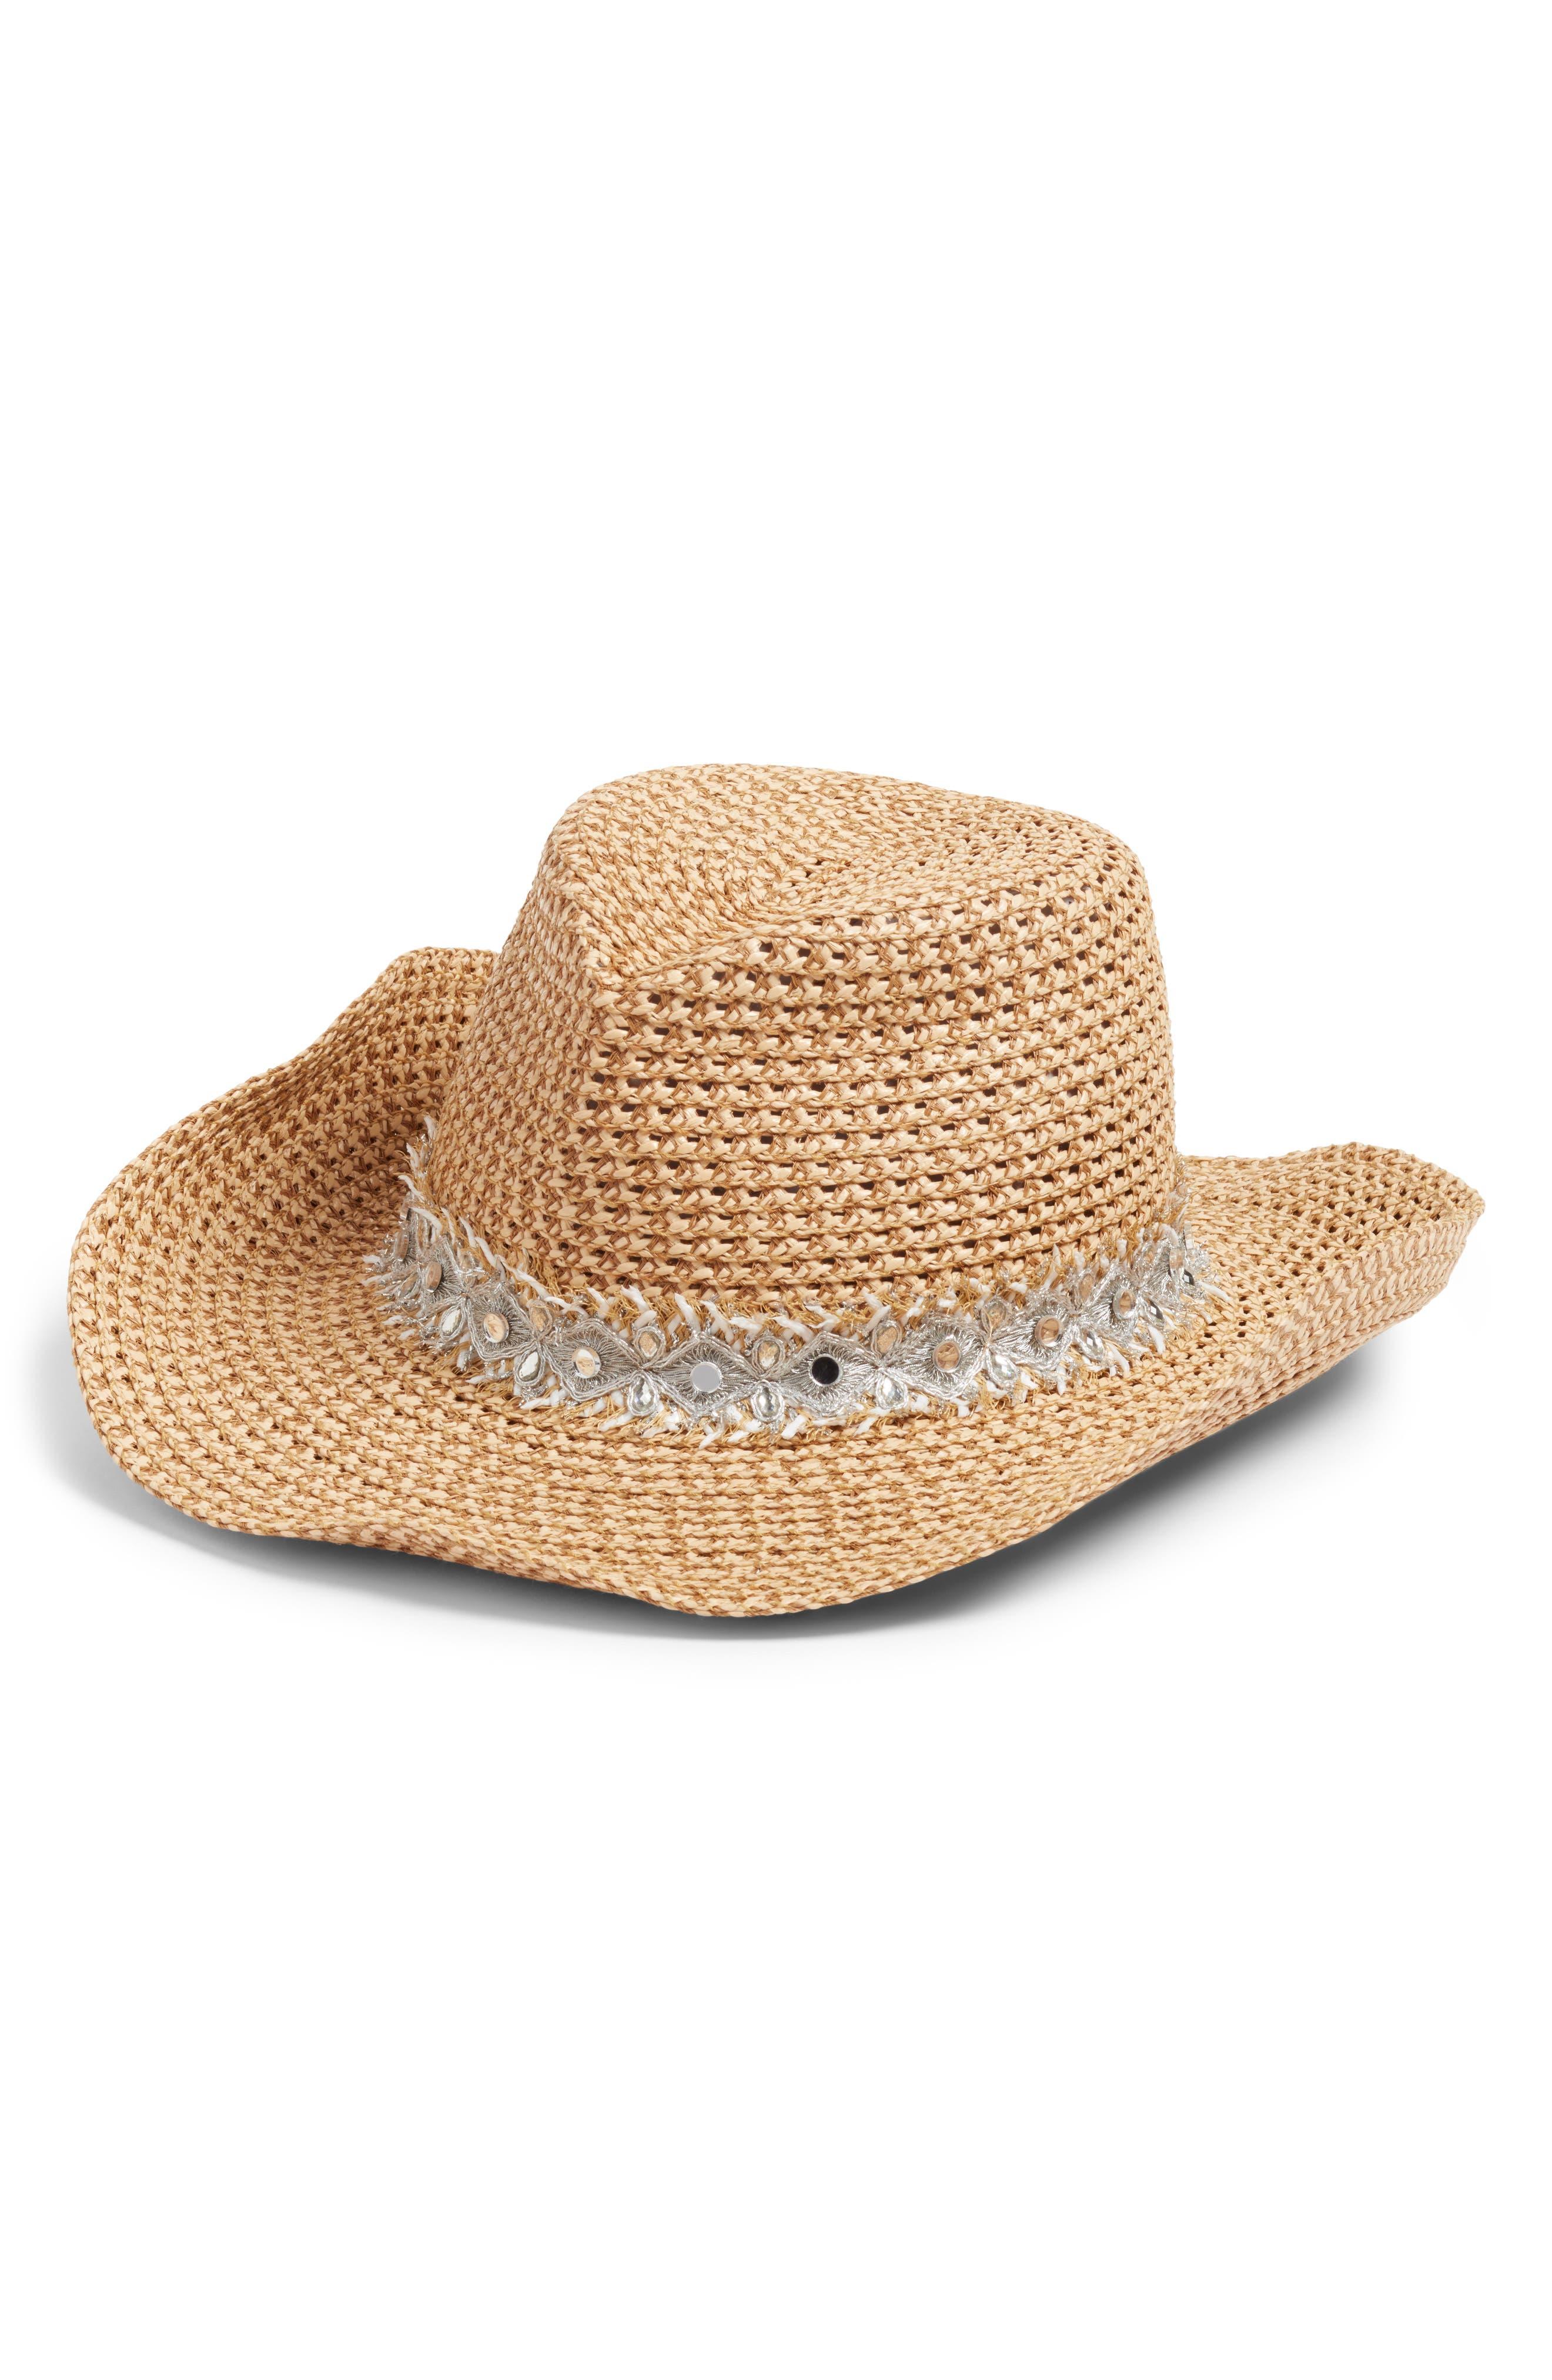 a42a3bf6885 Eric Javits Ariela Squishee Western Hat - Brown In Peanut  Silver ...